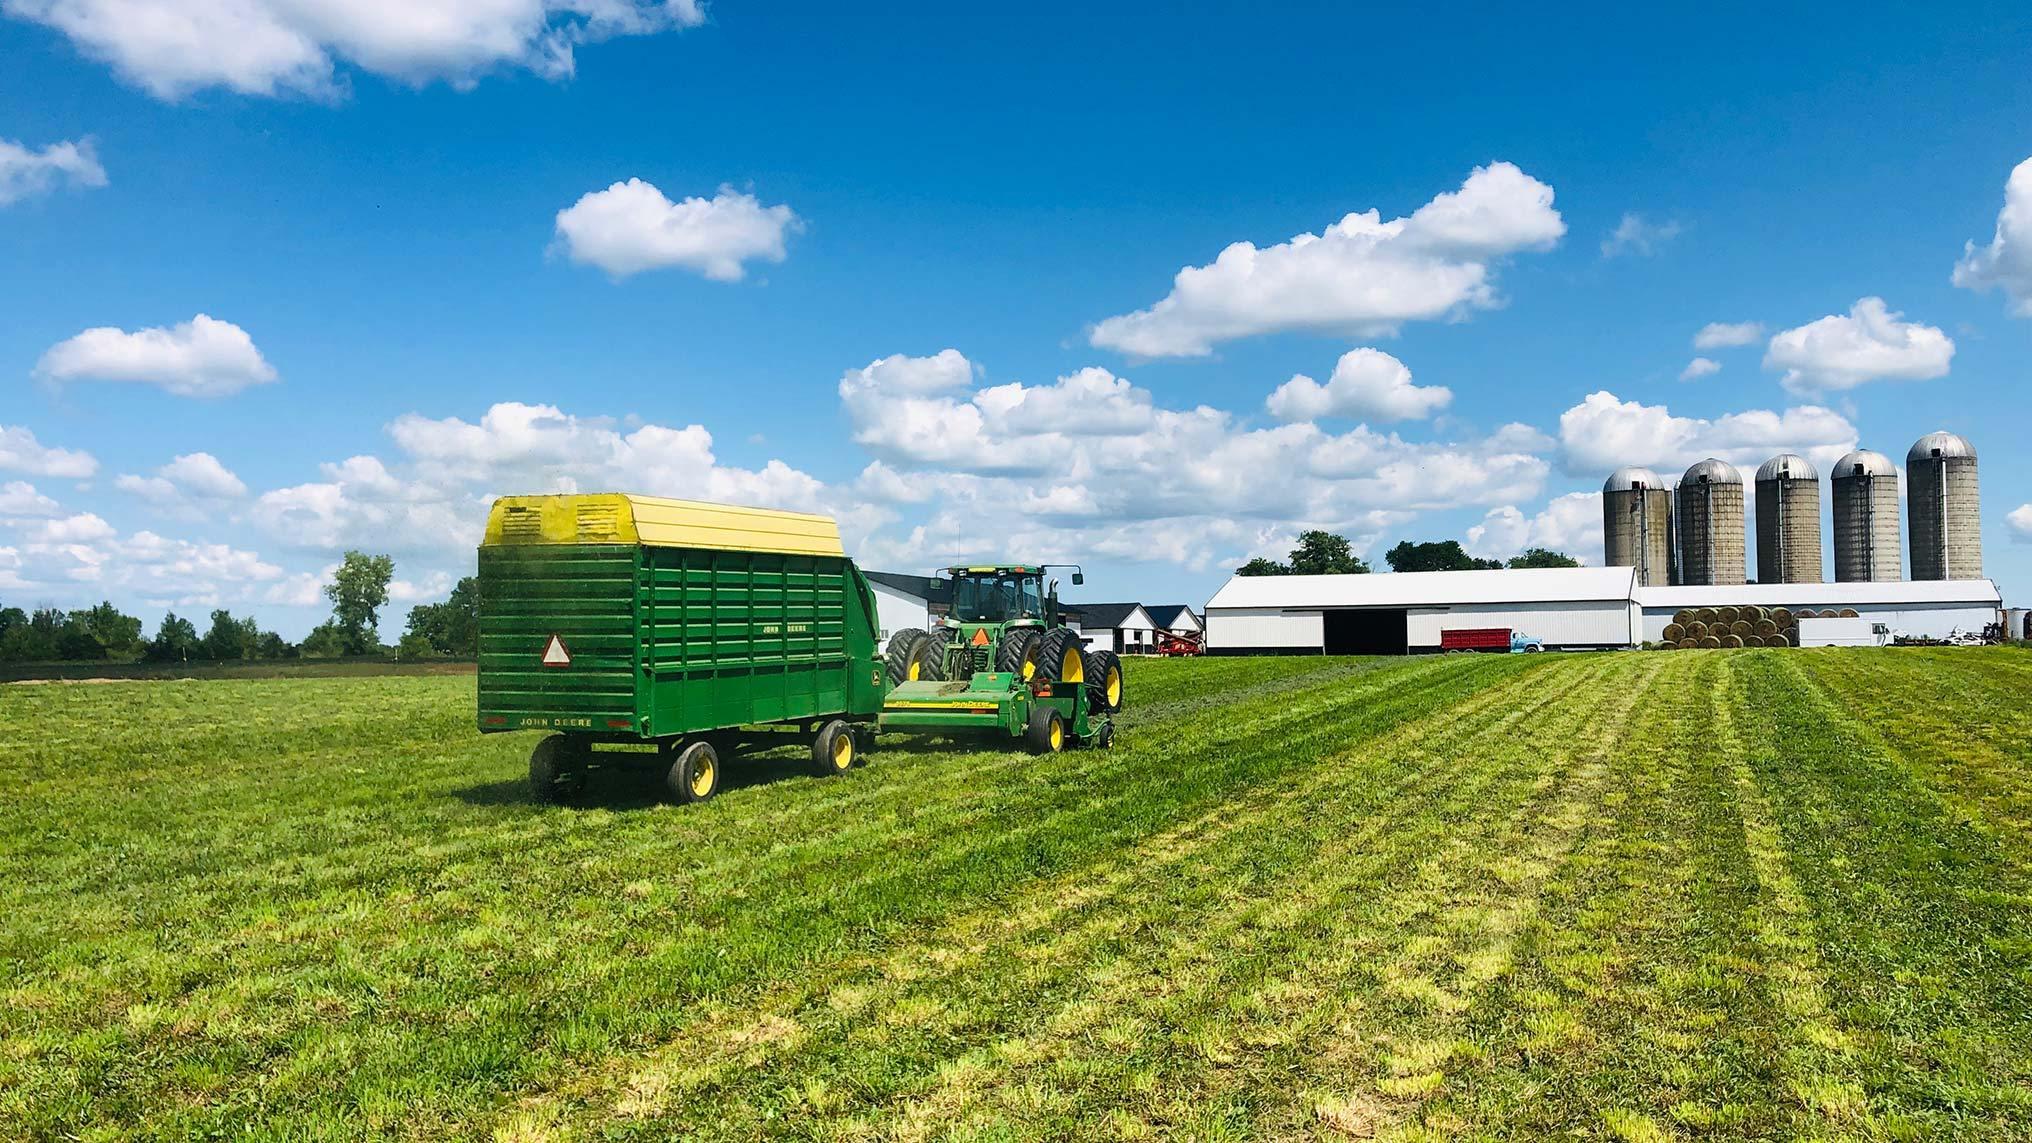 Kip Siegler Farming Products Farm Focused